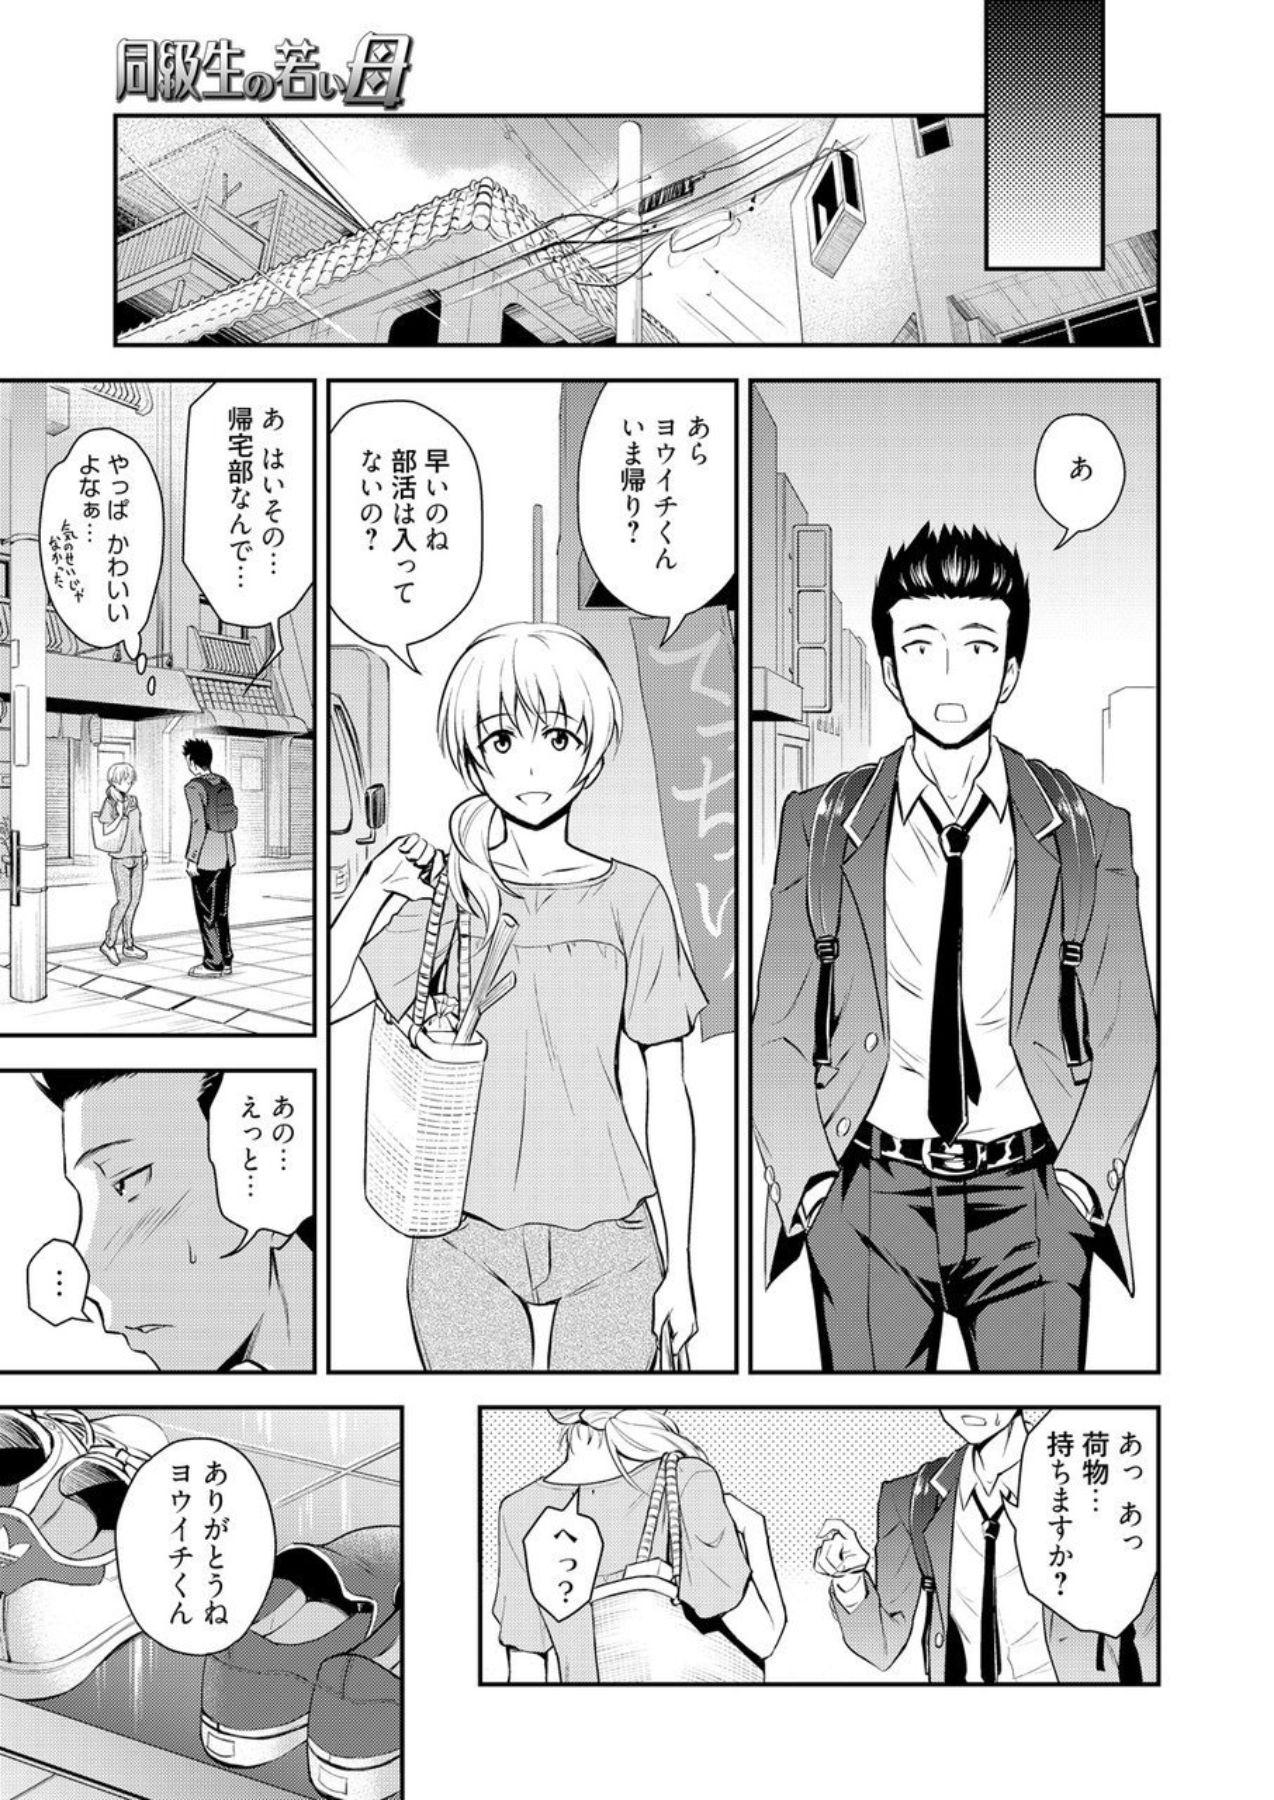 Doukyuusei no Wakai Haha 3